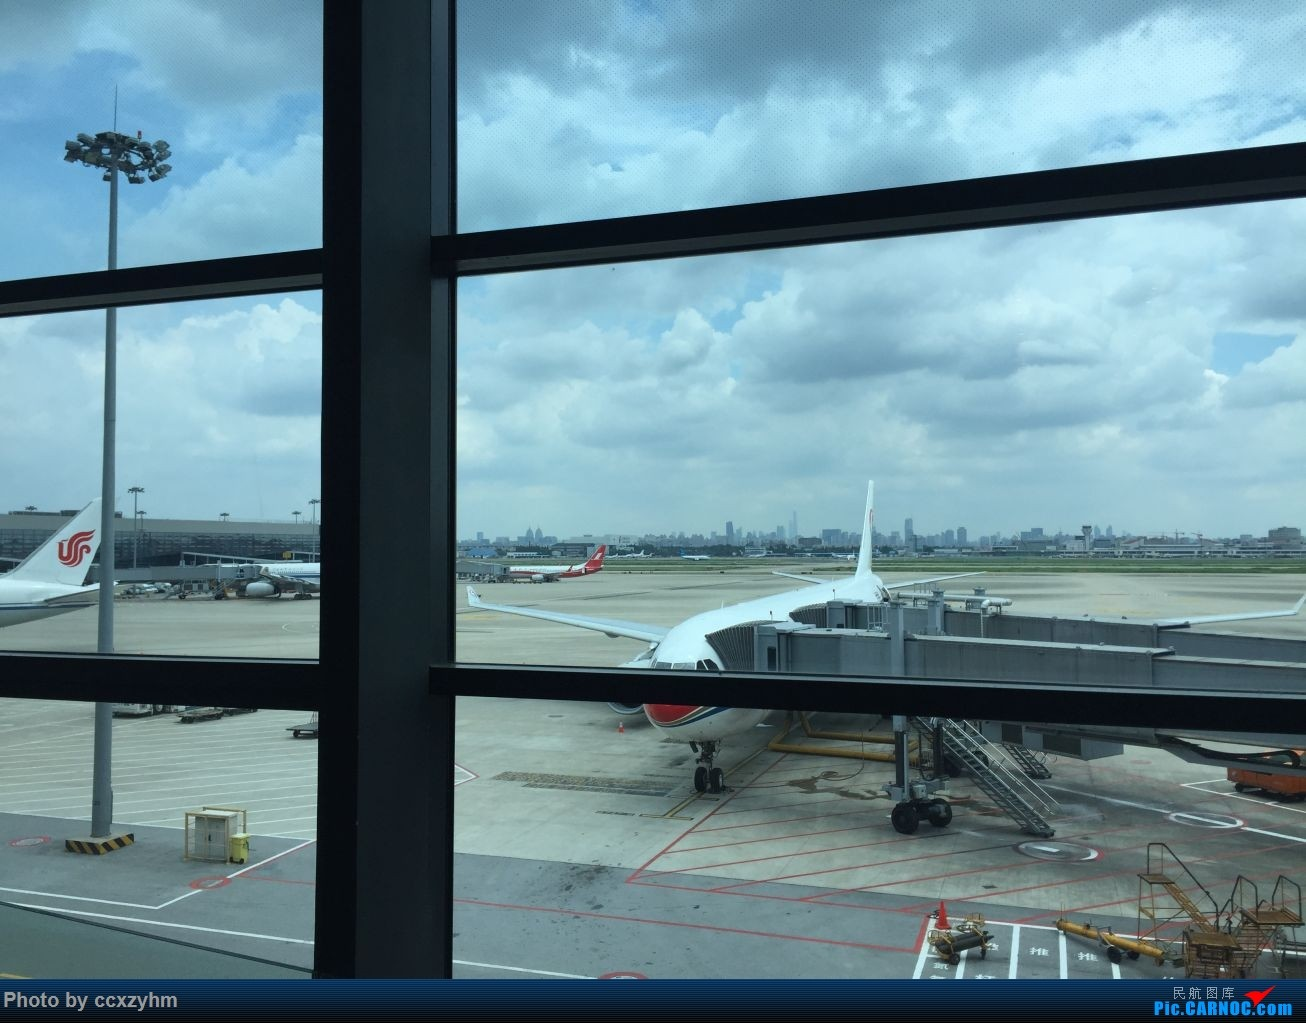 Re:[原创]论坛首发 京沪线上的国航789 高二升高三暑假短Break 空铁联运去北京    中国上海虹桥国际机场